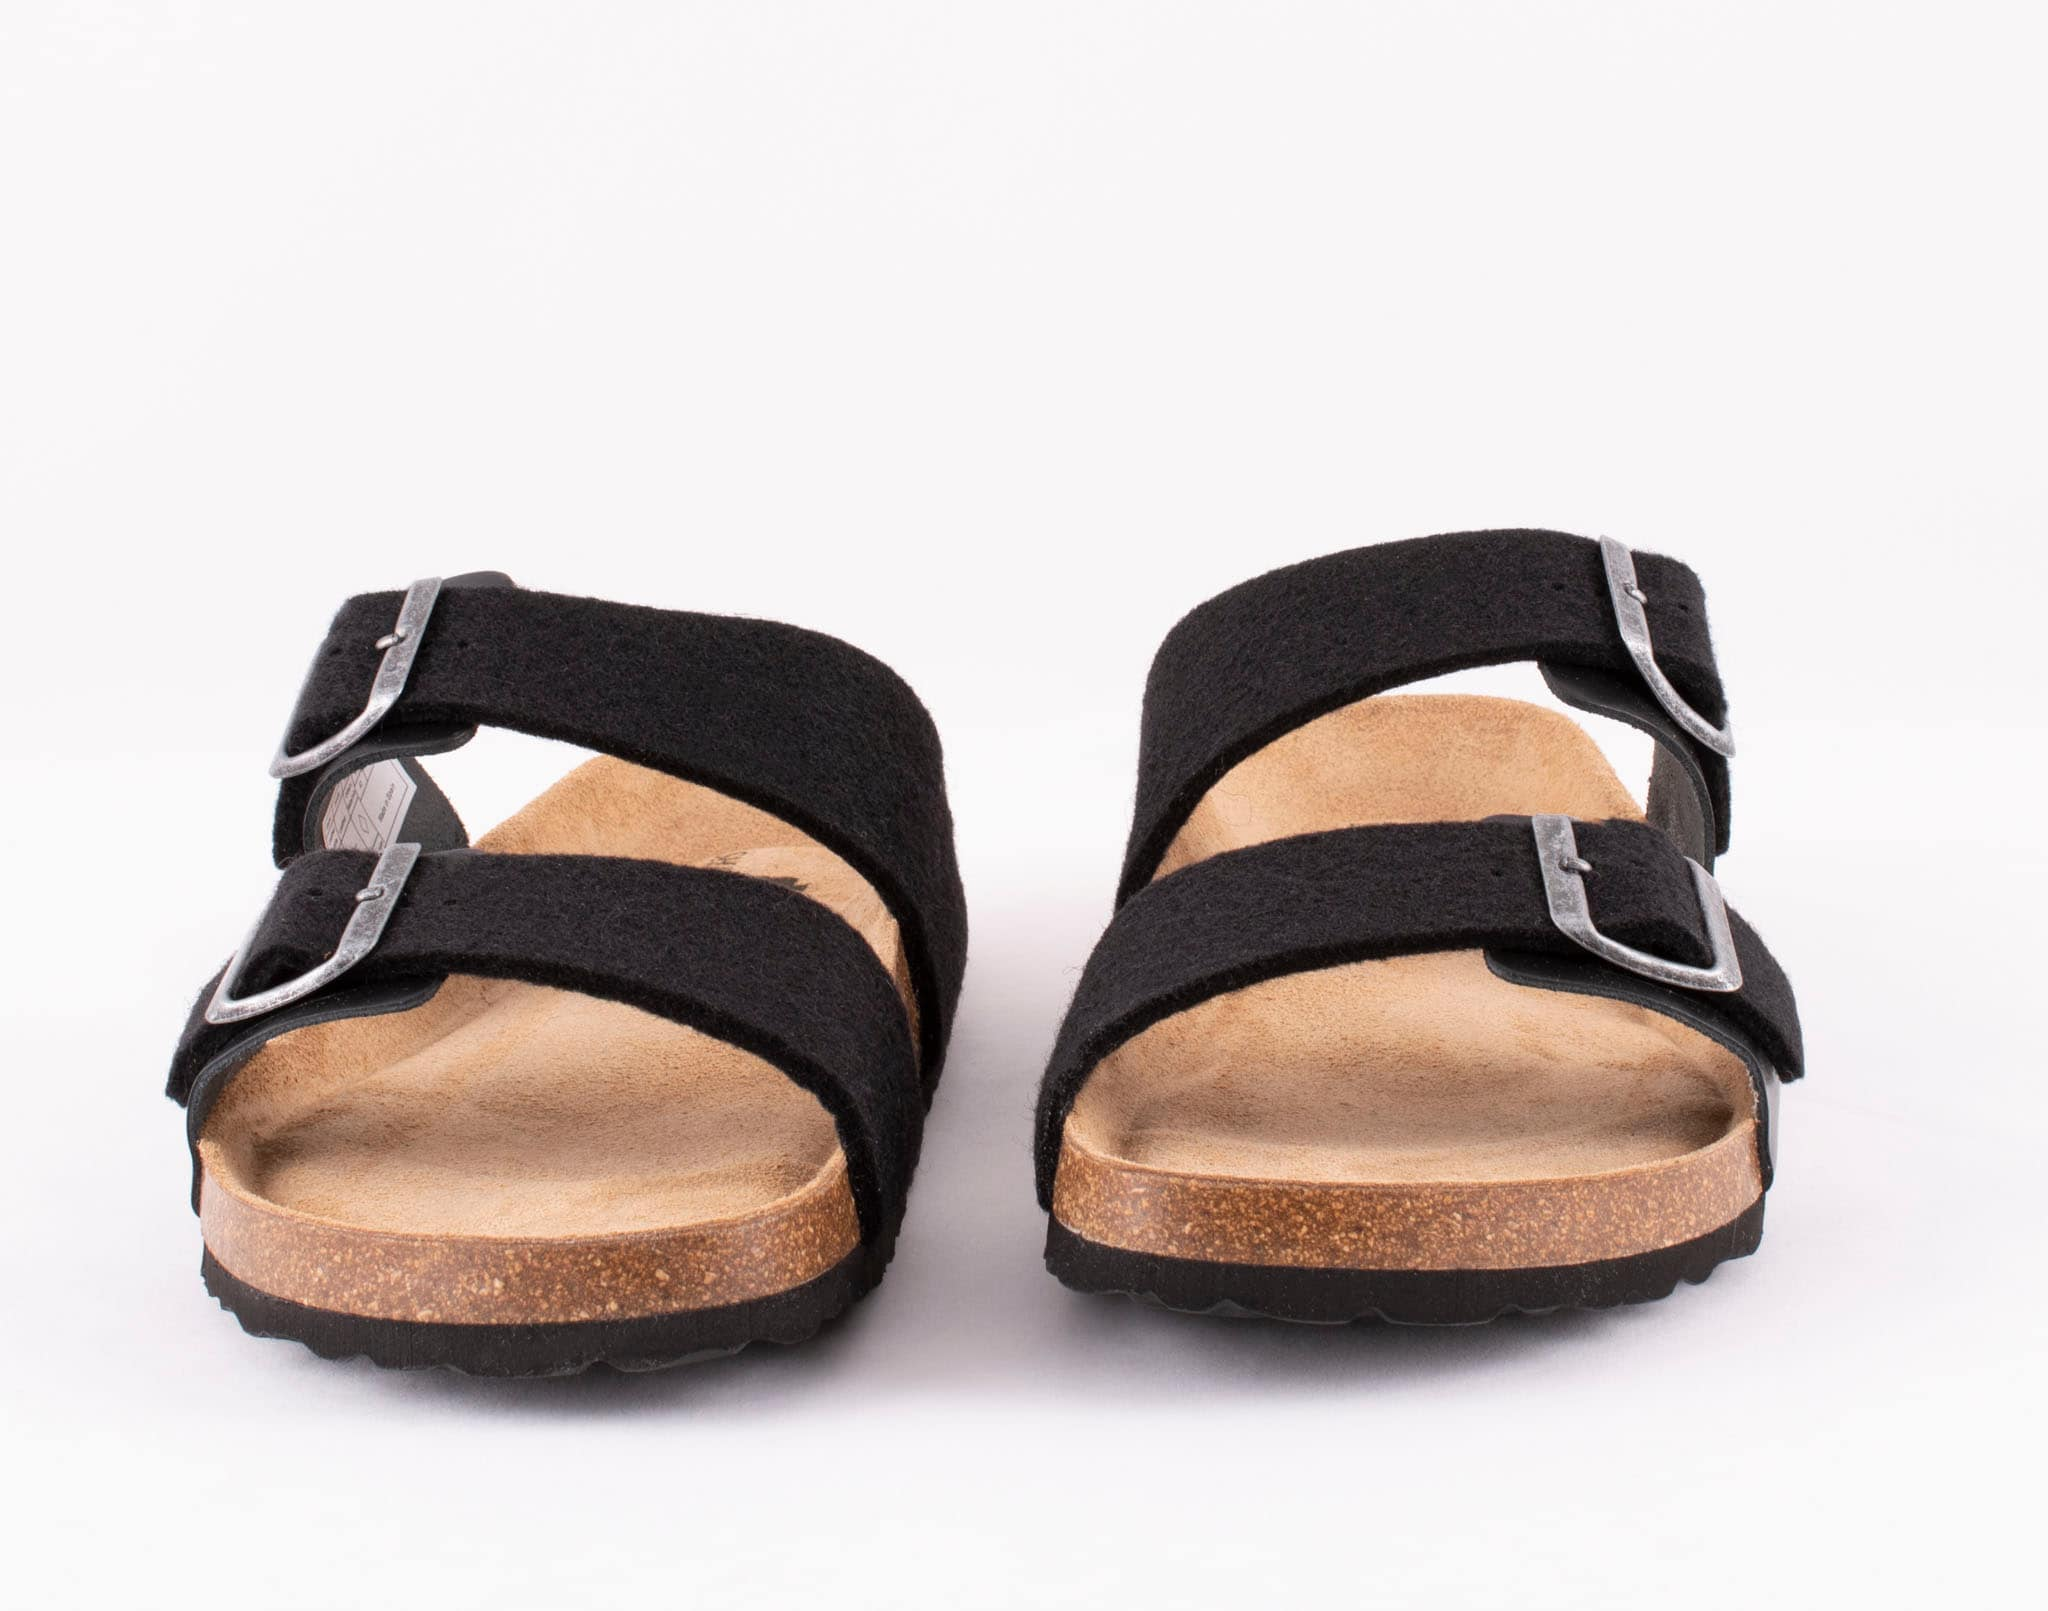 Christian sandals Black